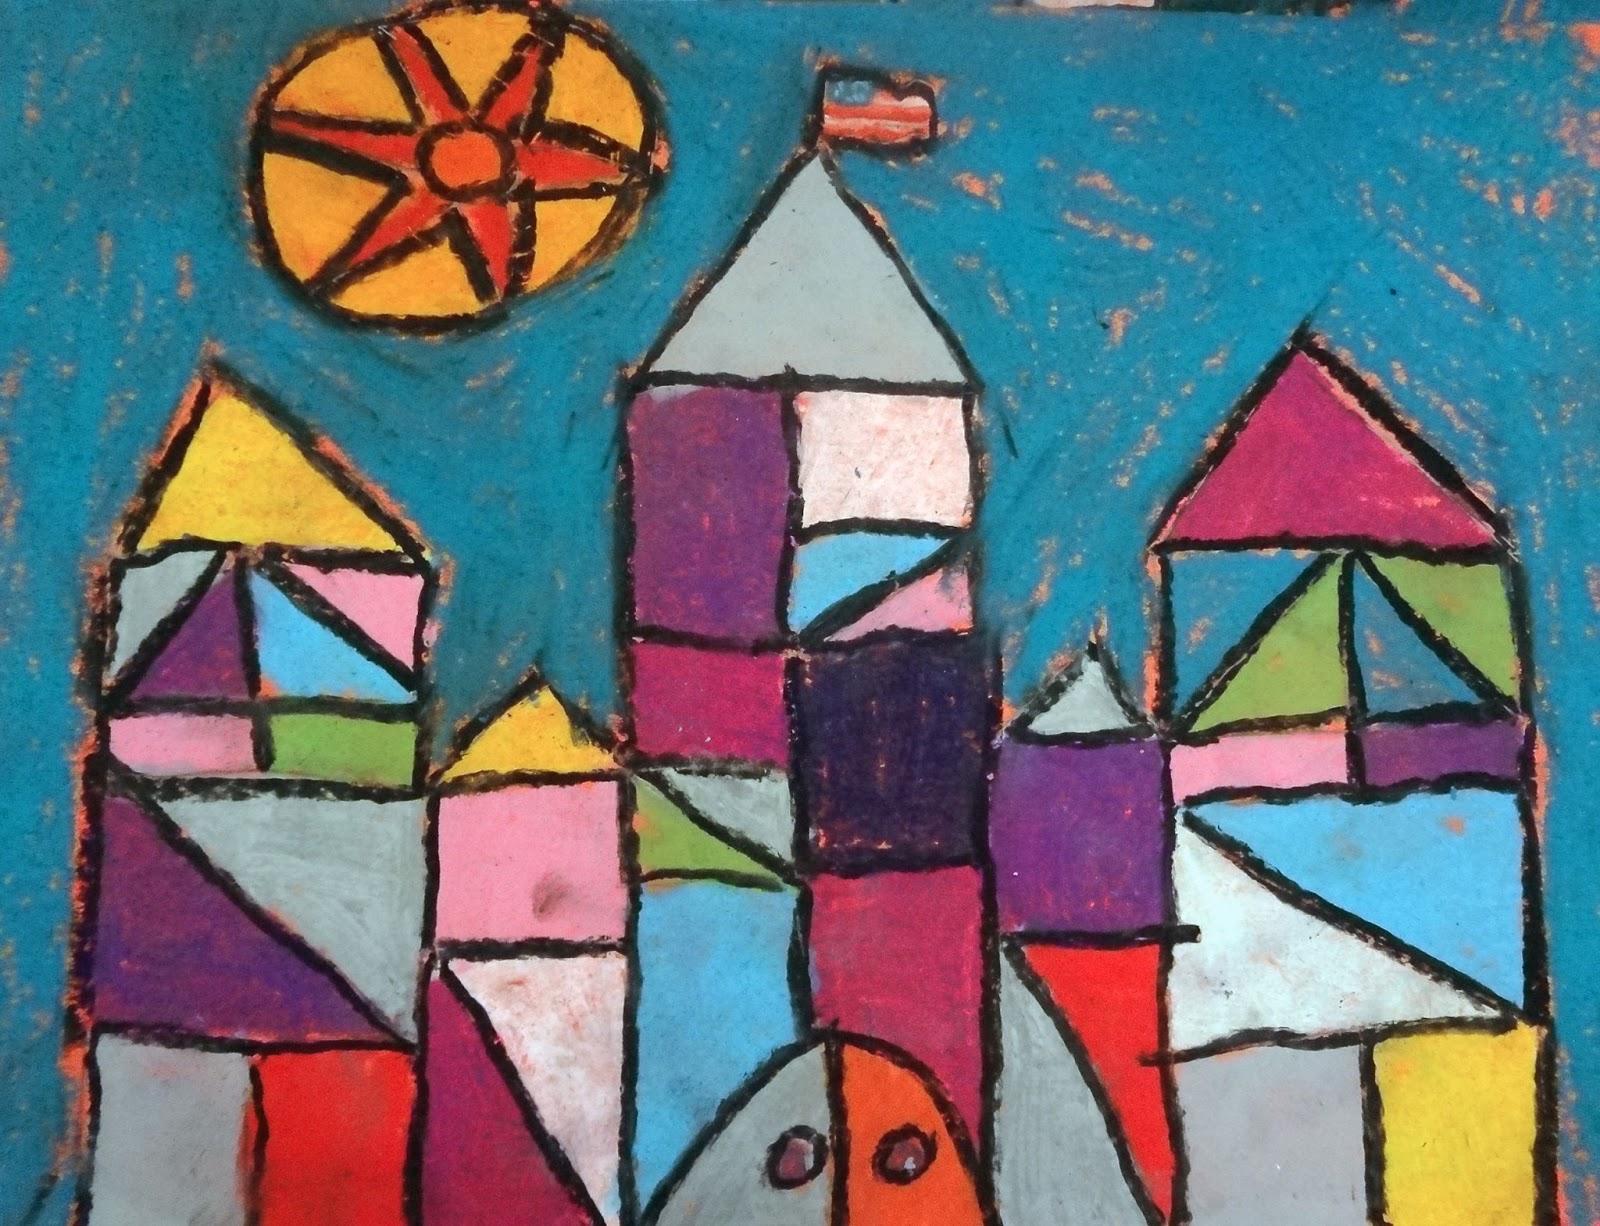 The Talking Walls Paul Klee Cubism Castles